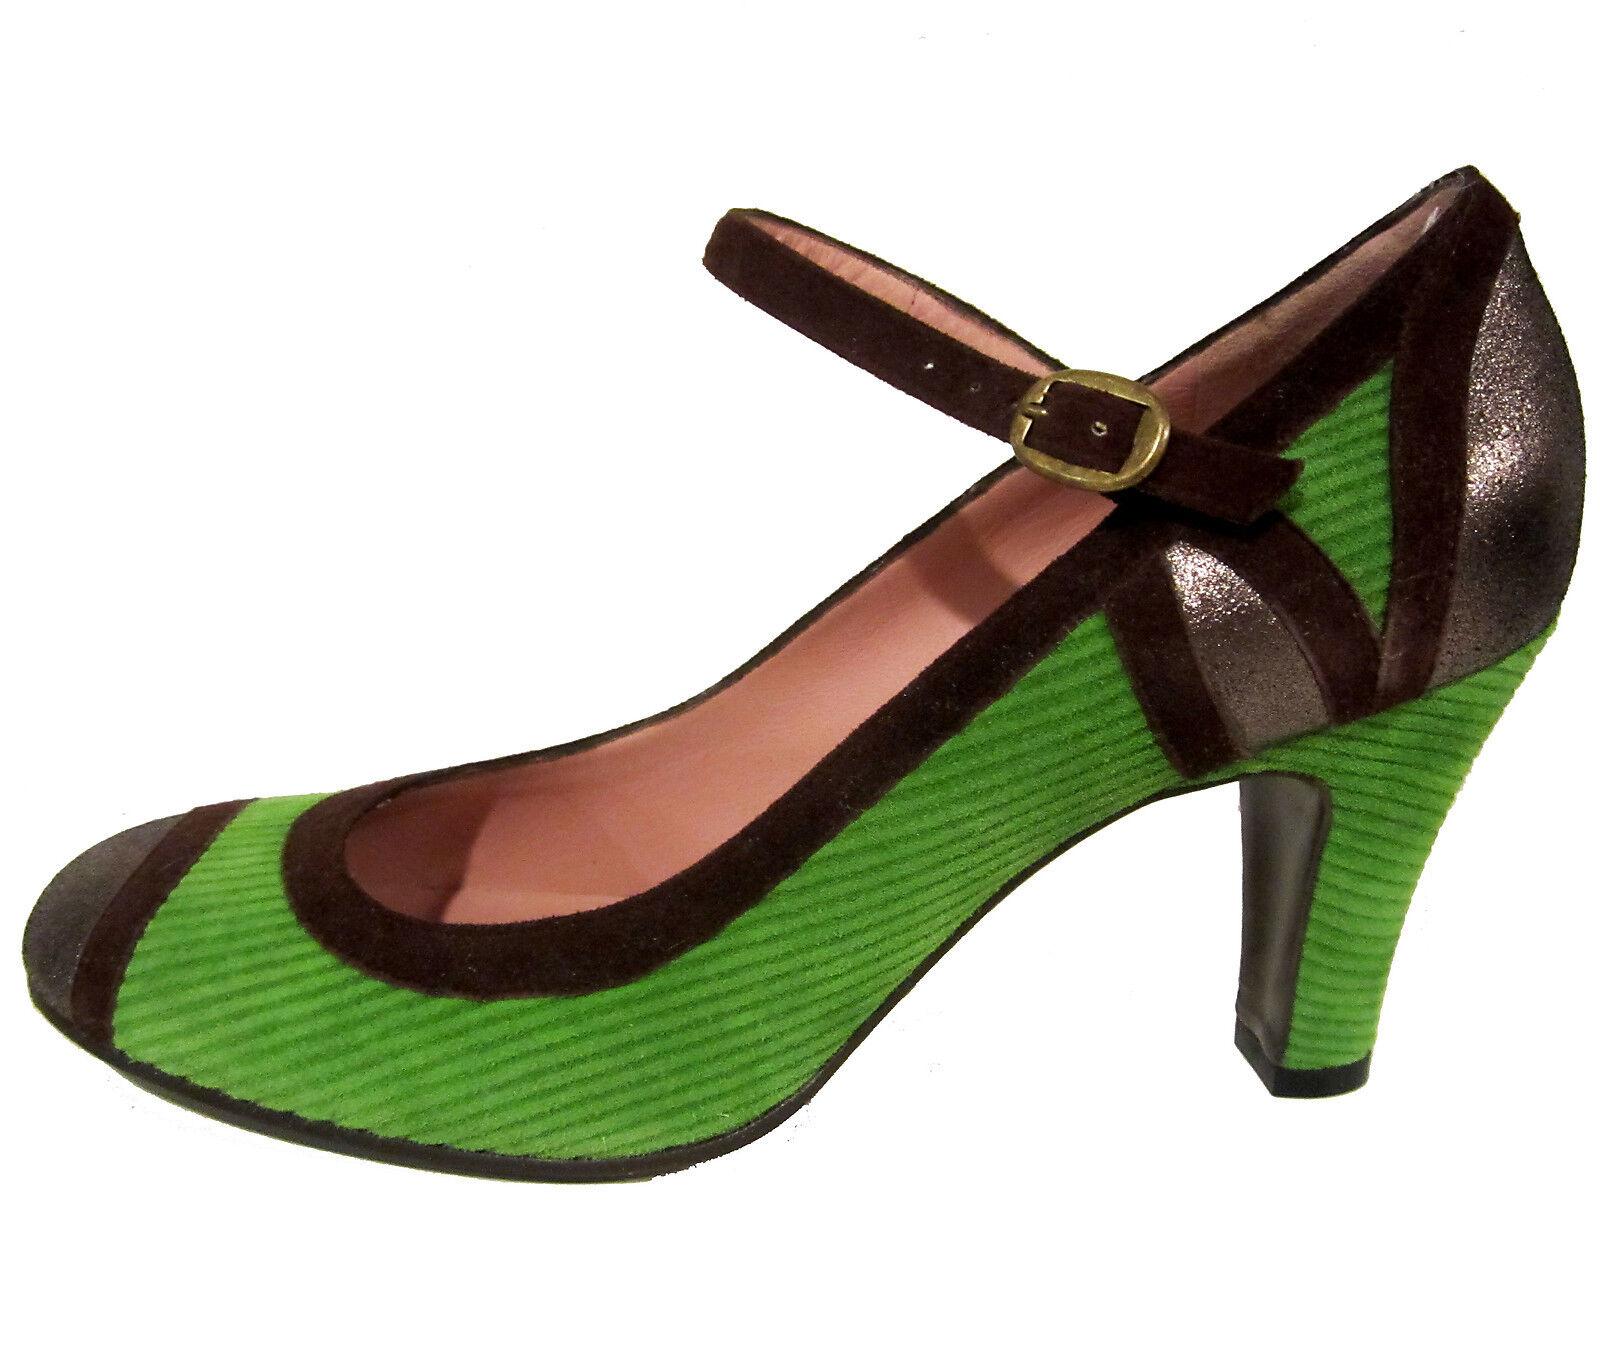 Marc by Marc Jacobs green heels 9.5 US 39.5 EU corduroy cap toe shoes NEW  375